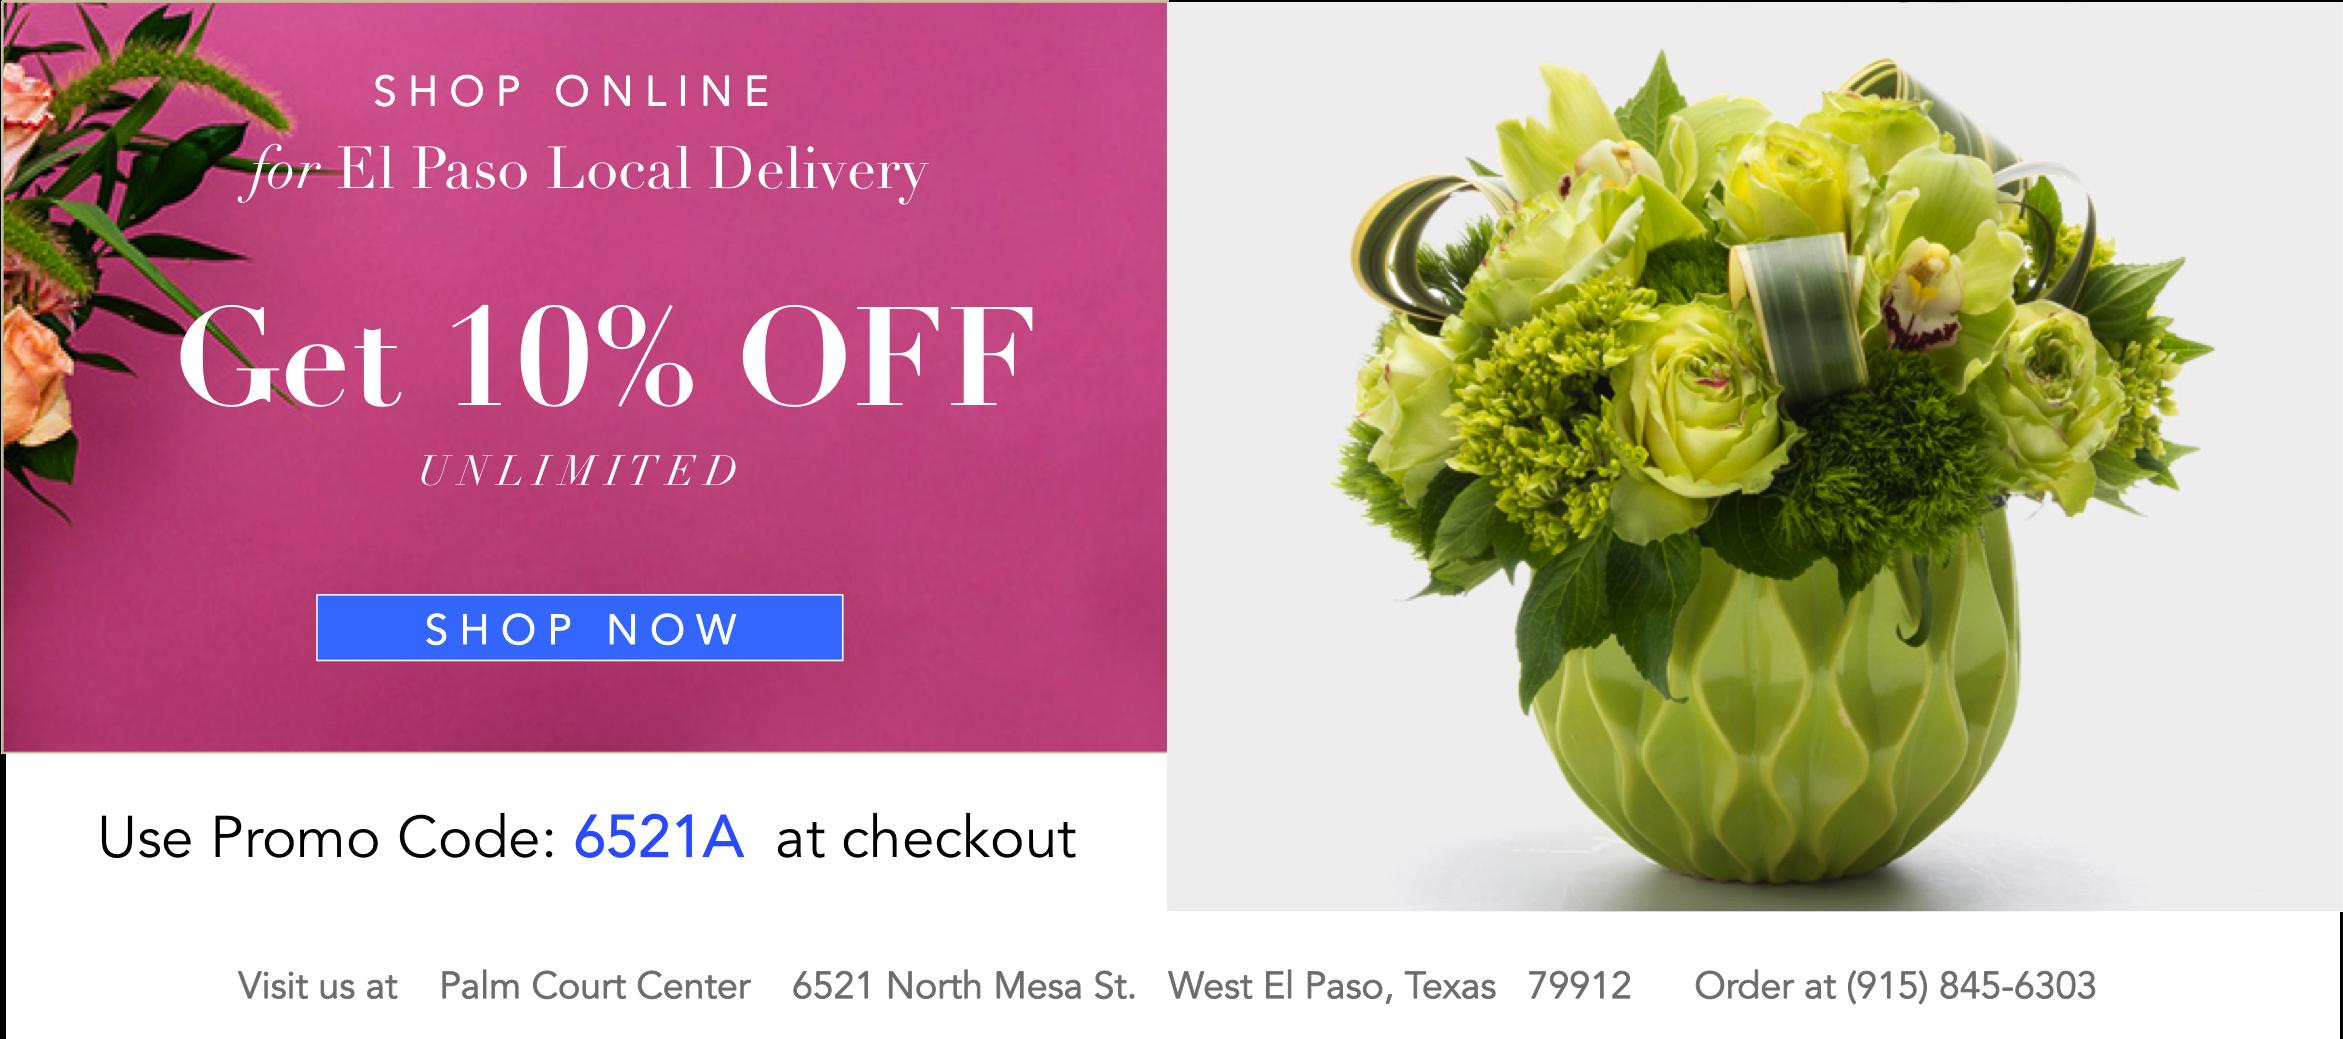 14aangies-floral-designs-el-paso-florist-79912-el-paso-texas-angies-flowers-el-paso-flowershop-el-paso-flowerdelivery-elegant-flowers-79912-westside-weddings-events-rentals-bodas-flores.png